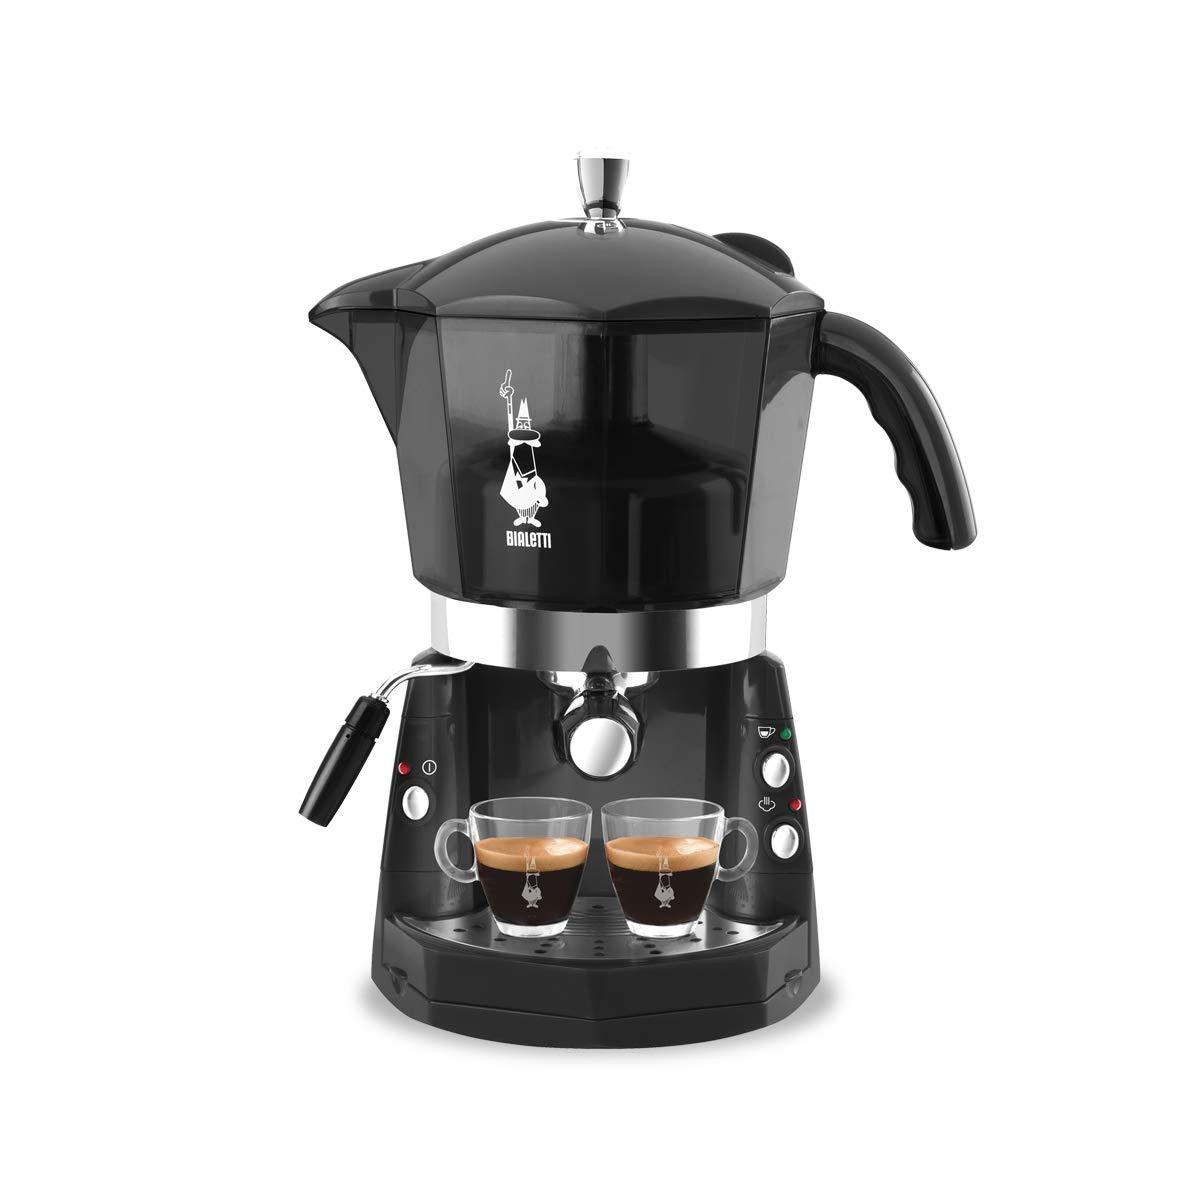 Bialetti 12400095 - Cafetera de cápsulas, 1.5 l, color negro ...